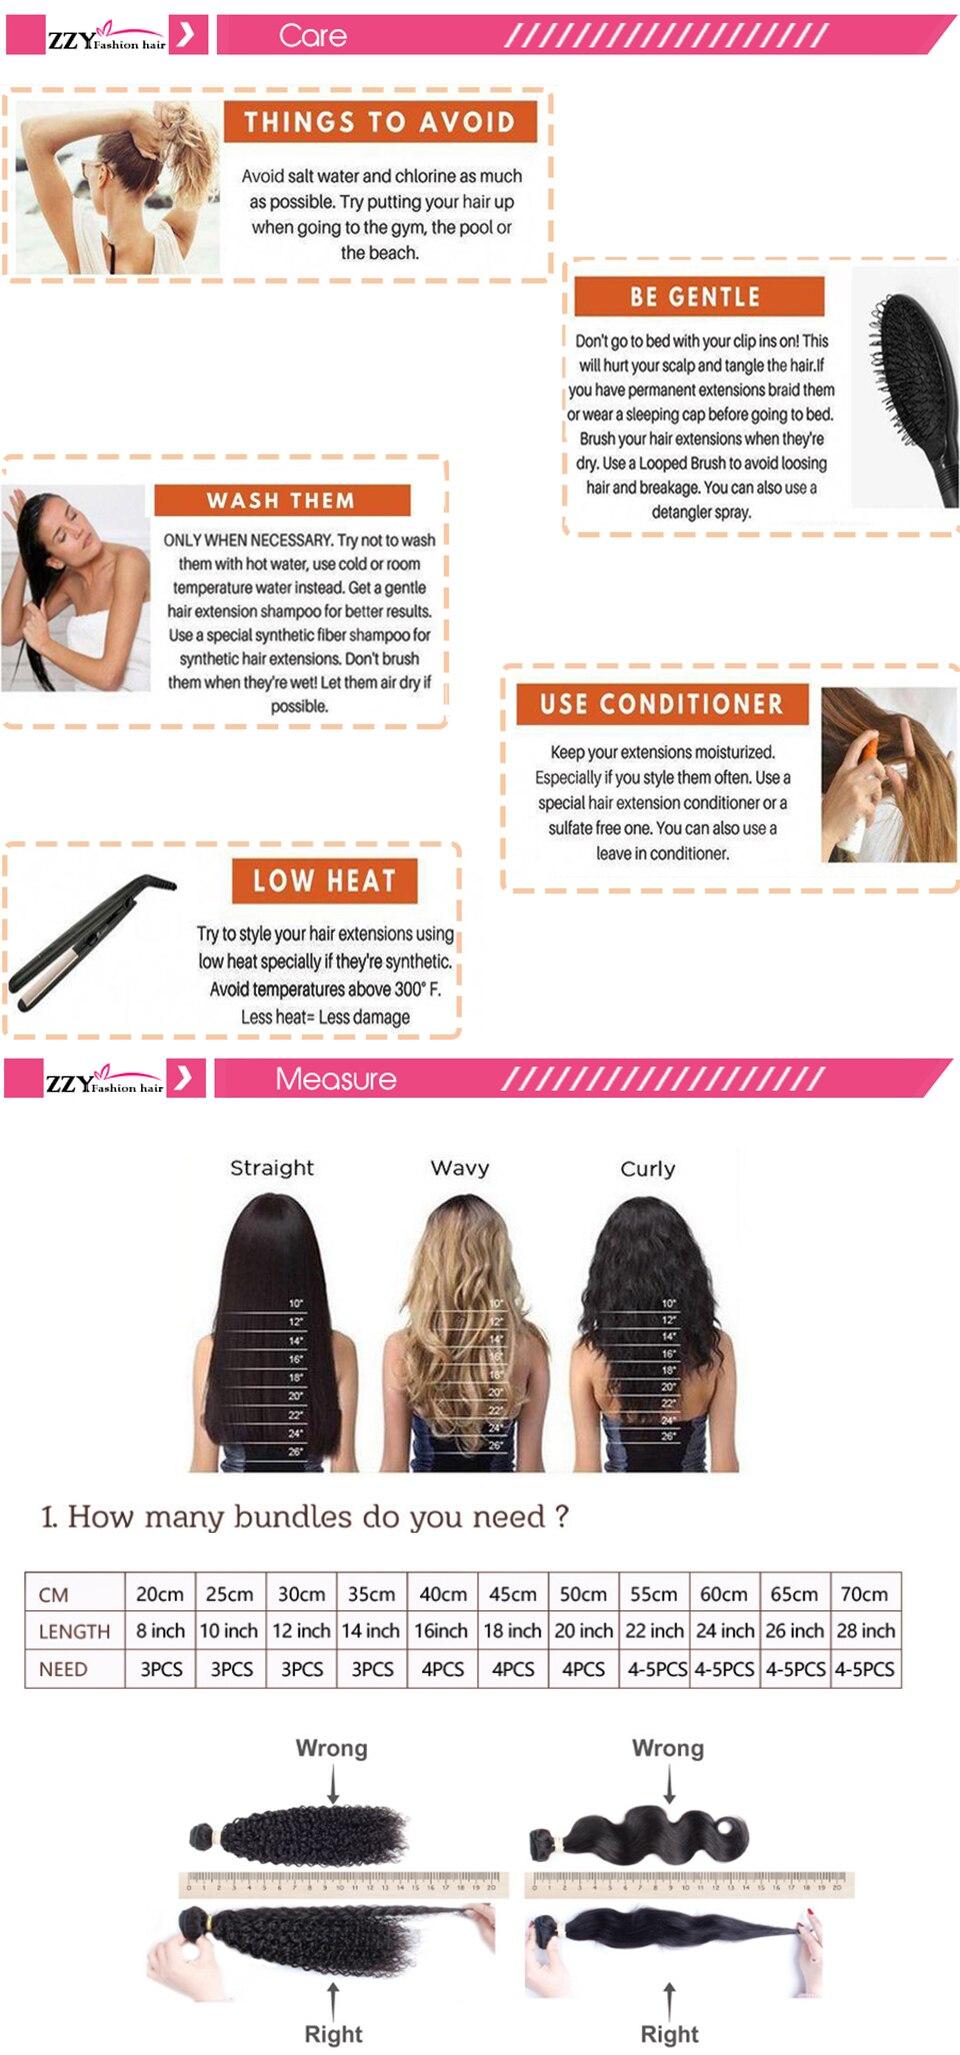 Hcdb7584b6d5c44238d12902efa211a06g ZZY Fashion Hair Brazilian Body Wave Bundles With Closure M Ratio Non-Remy Human Hair Weave Bundles With Closure